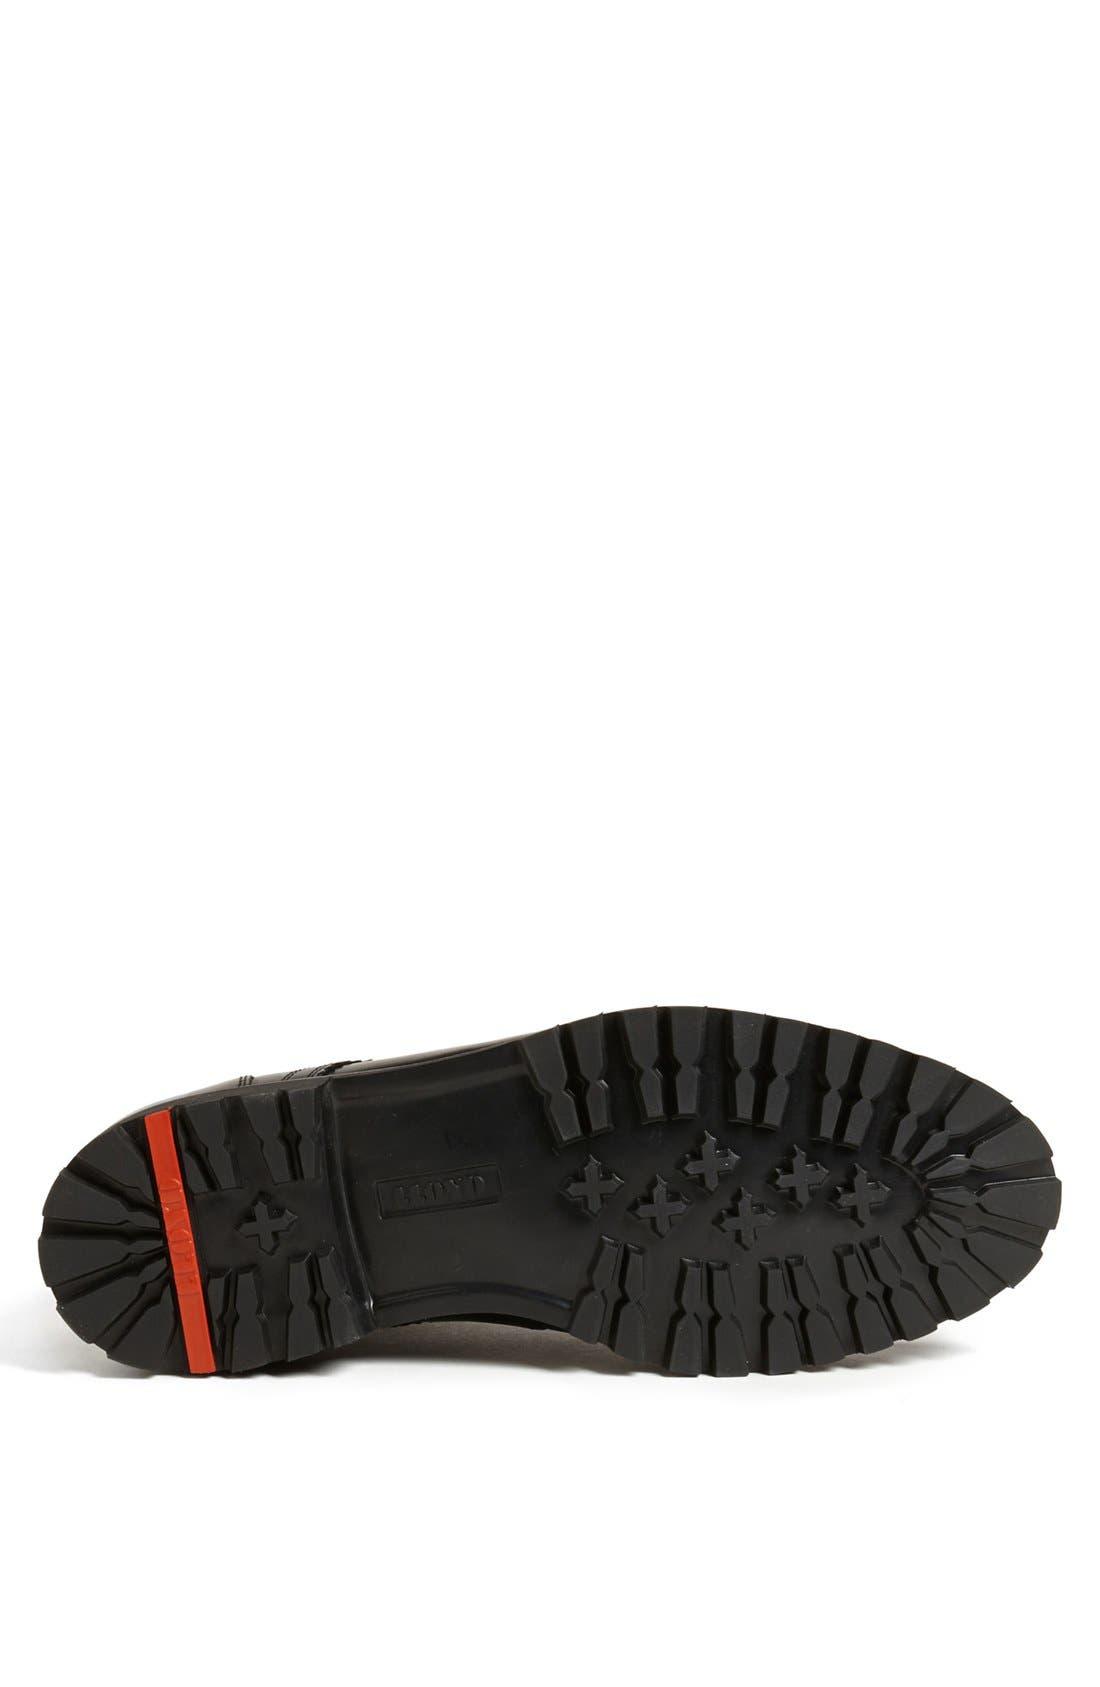 'Varello' Chukka Boot,                             Alternate thumbnail 4, color,                             Black